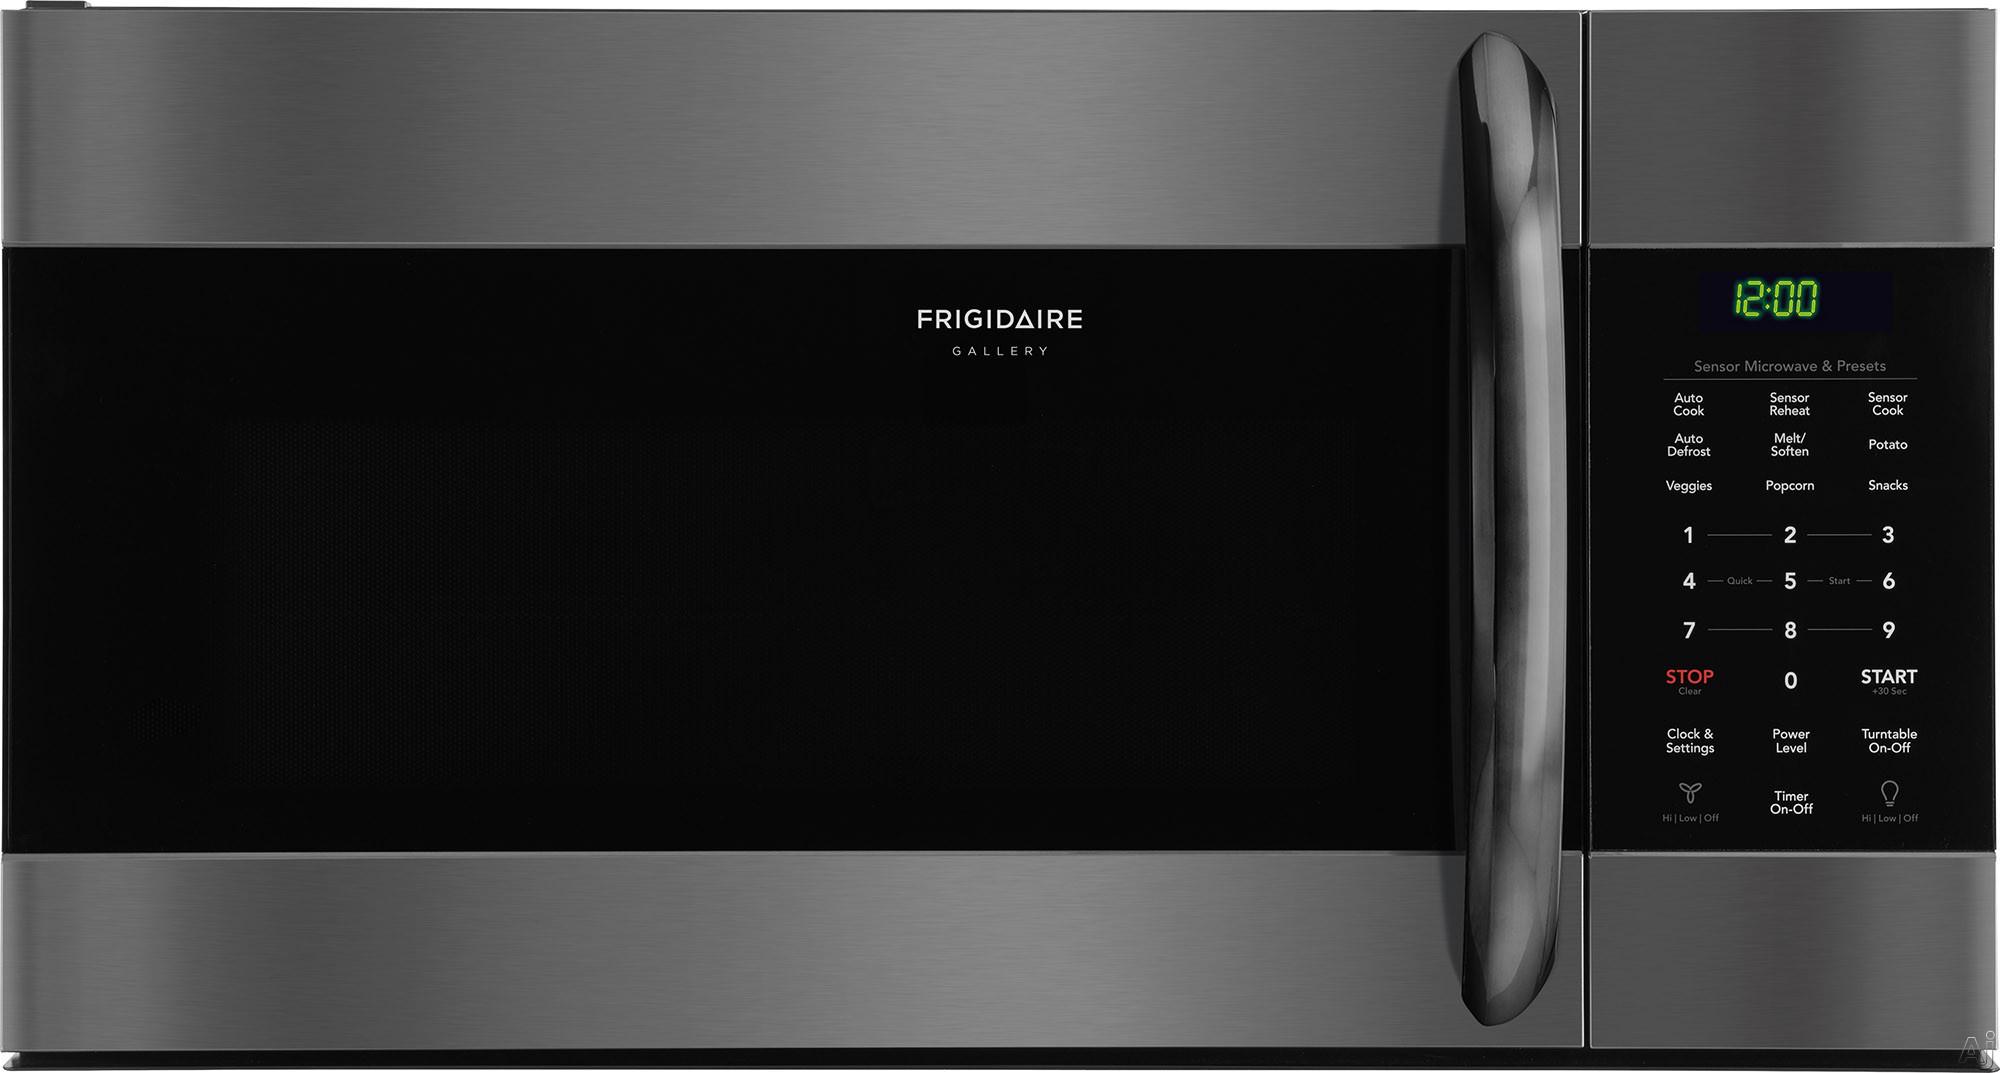 Frigidaire Gallery Series FGMV176NTD 30 Inch Over the Range Microwave with Sensor Cooking, SpaceWise® Rack, PureAir® Microwave Filter, Effortless Clean™ Interior, Effortless™ Reheat,